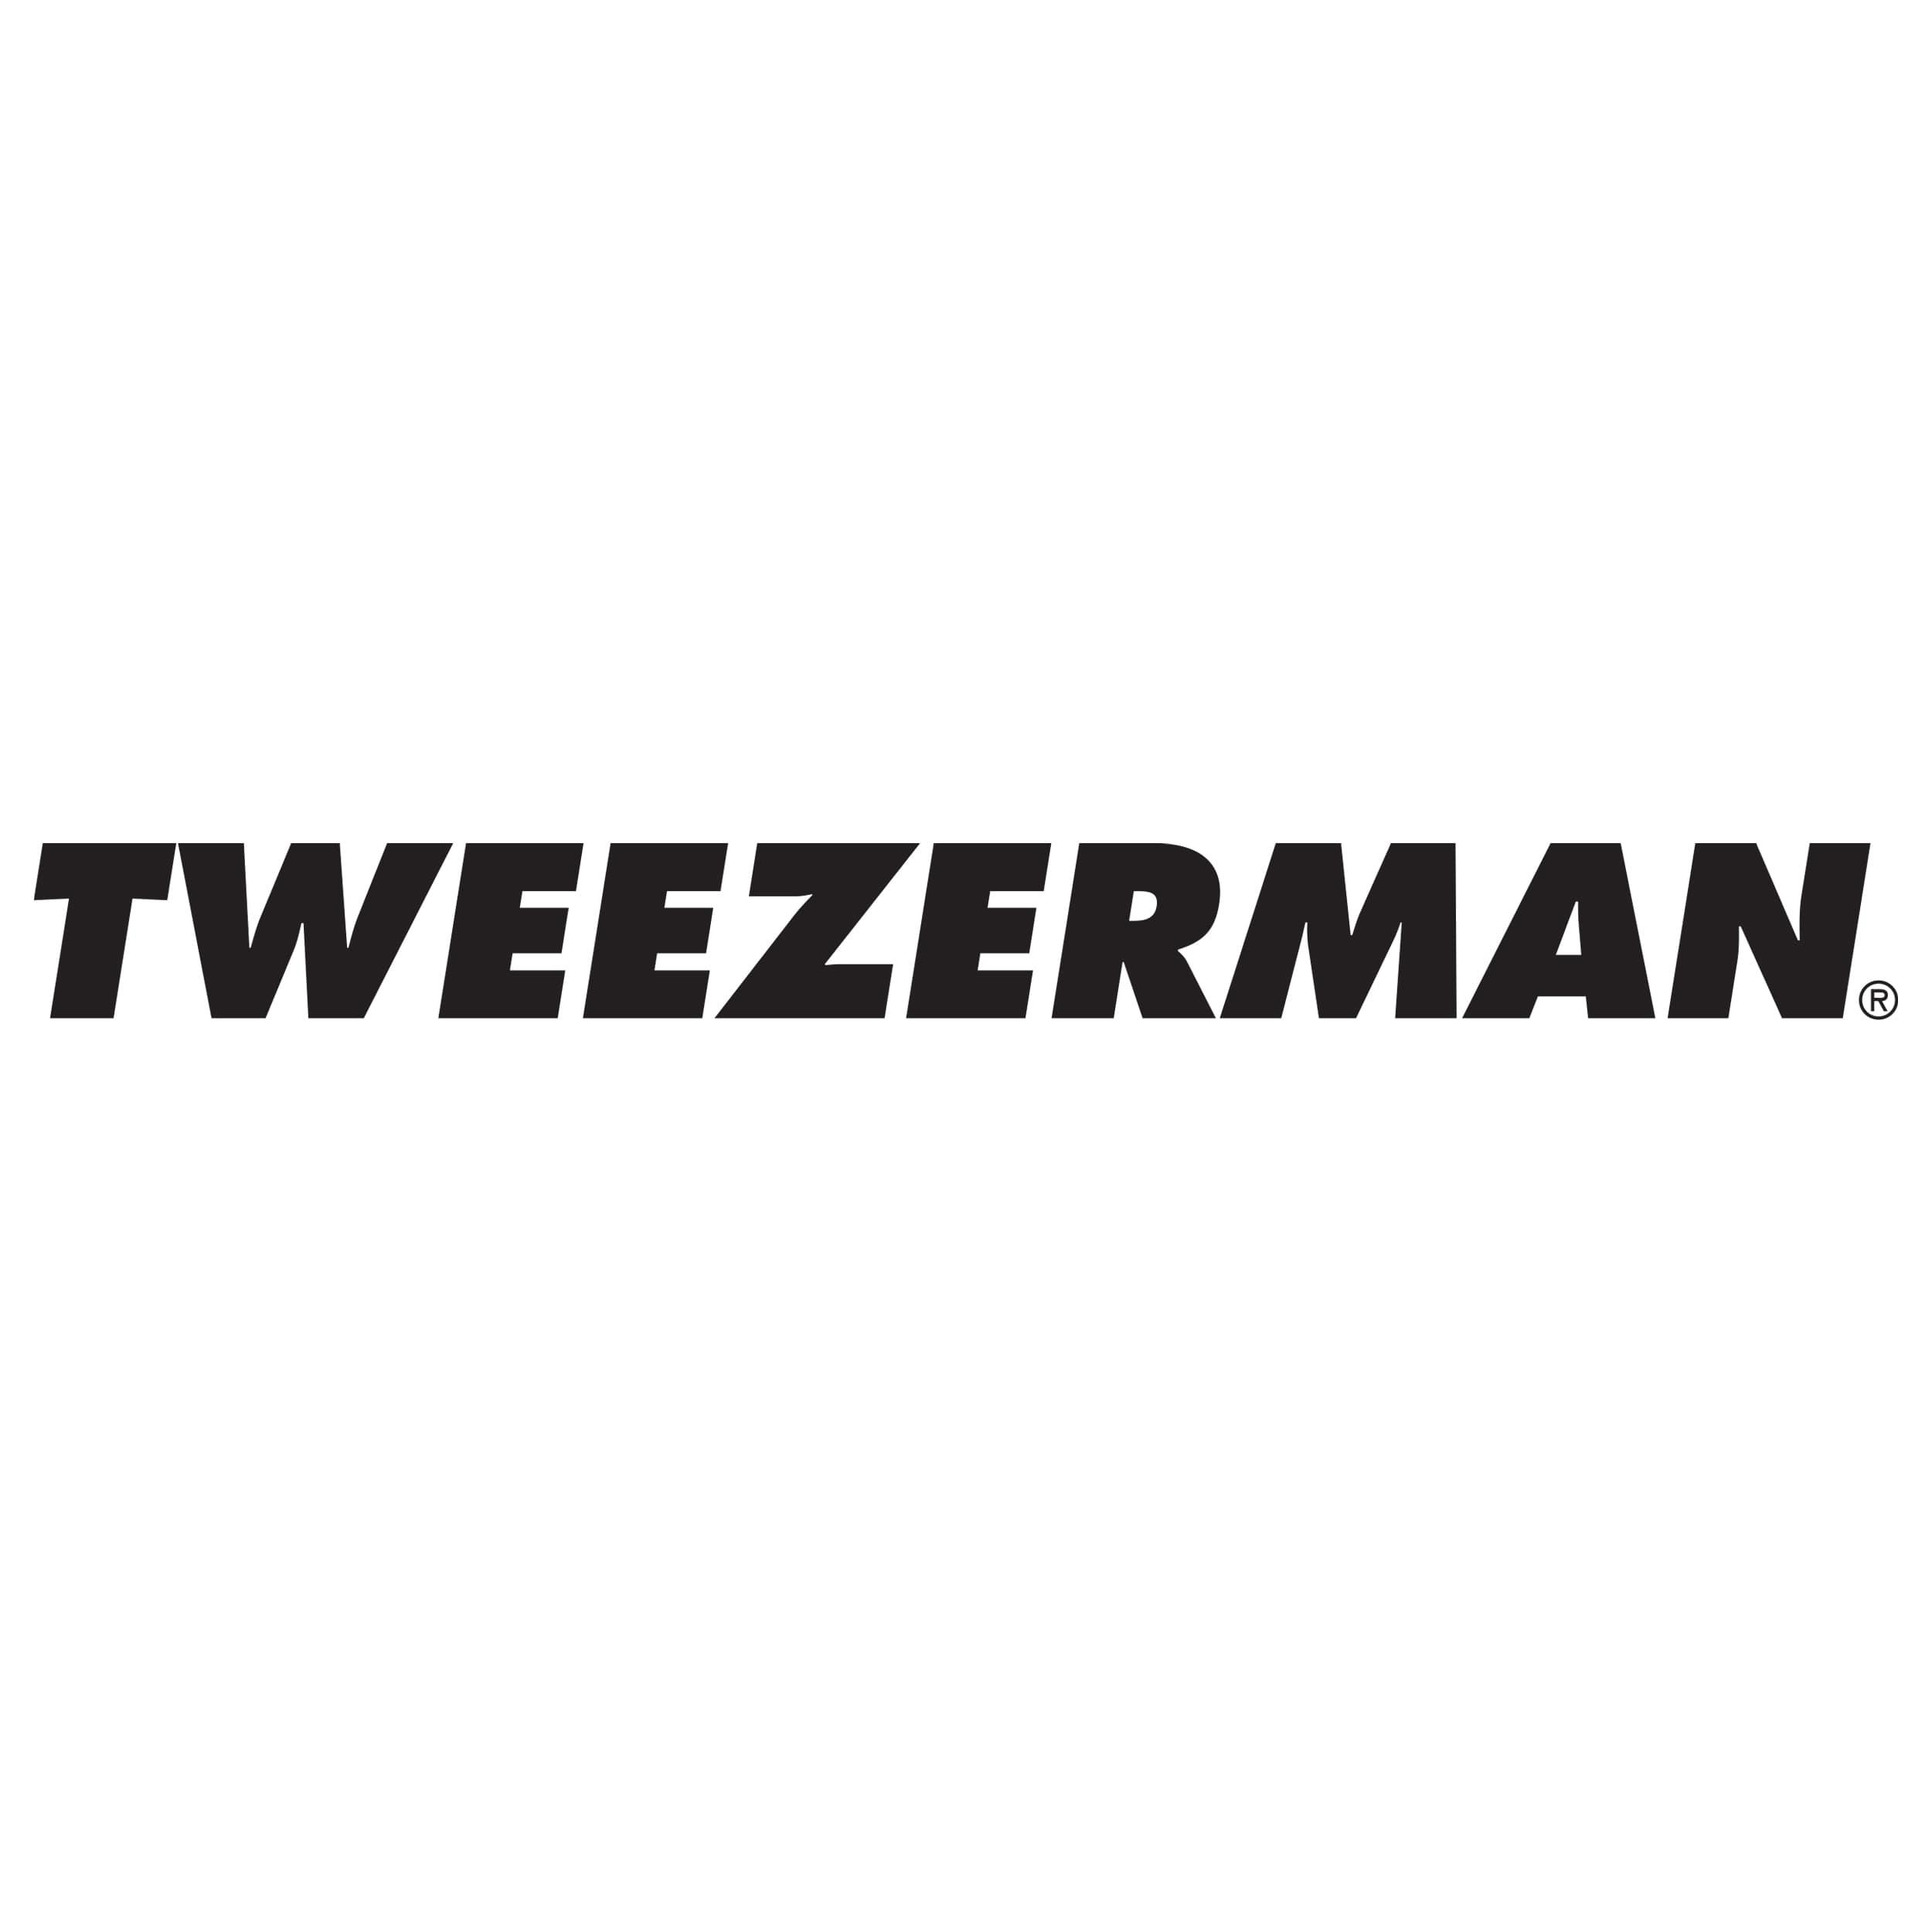 Brow Trimming Scissors Shaping Brush Tweezerman